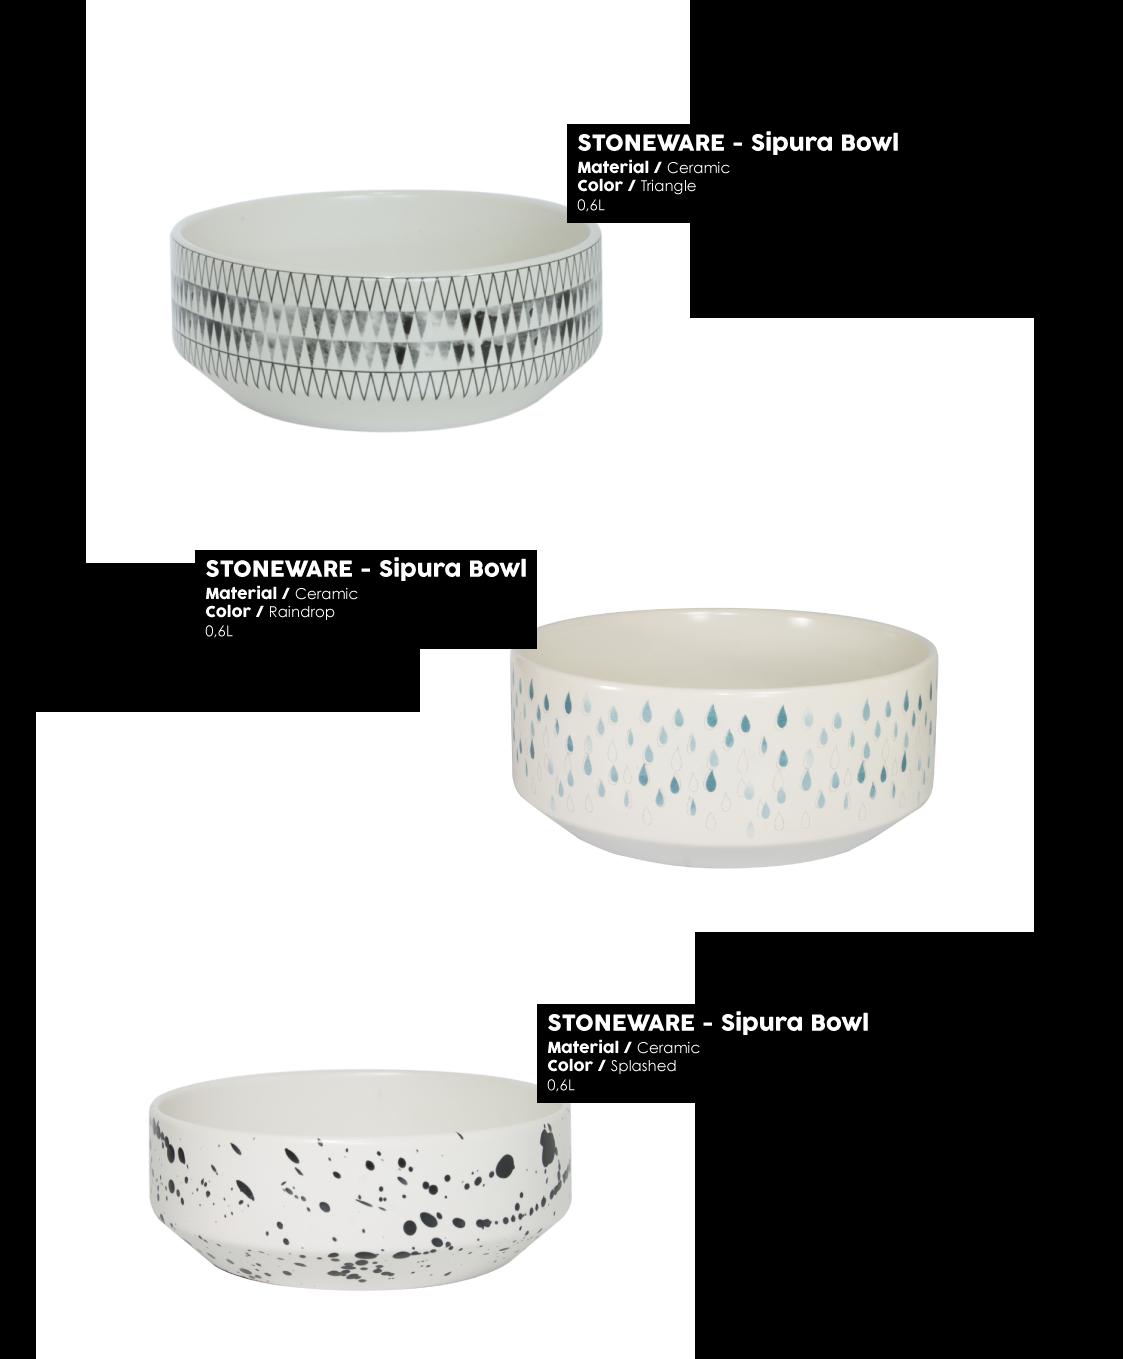 Stoneware Sipura bowl